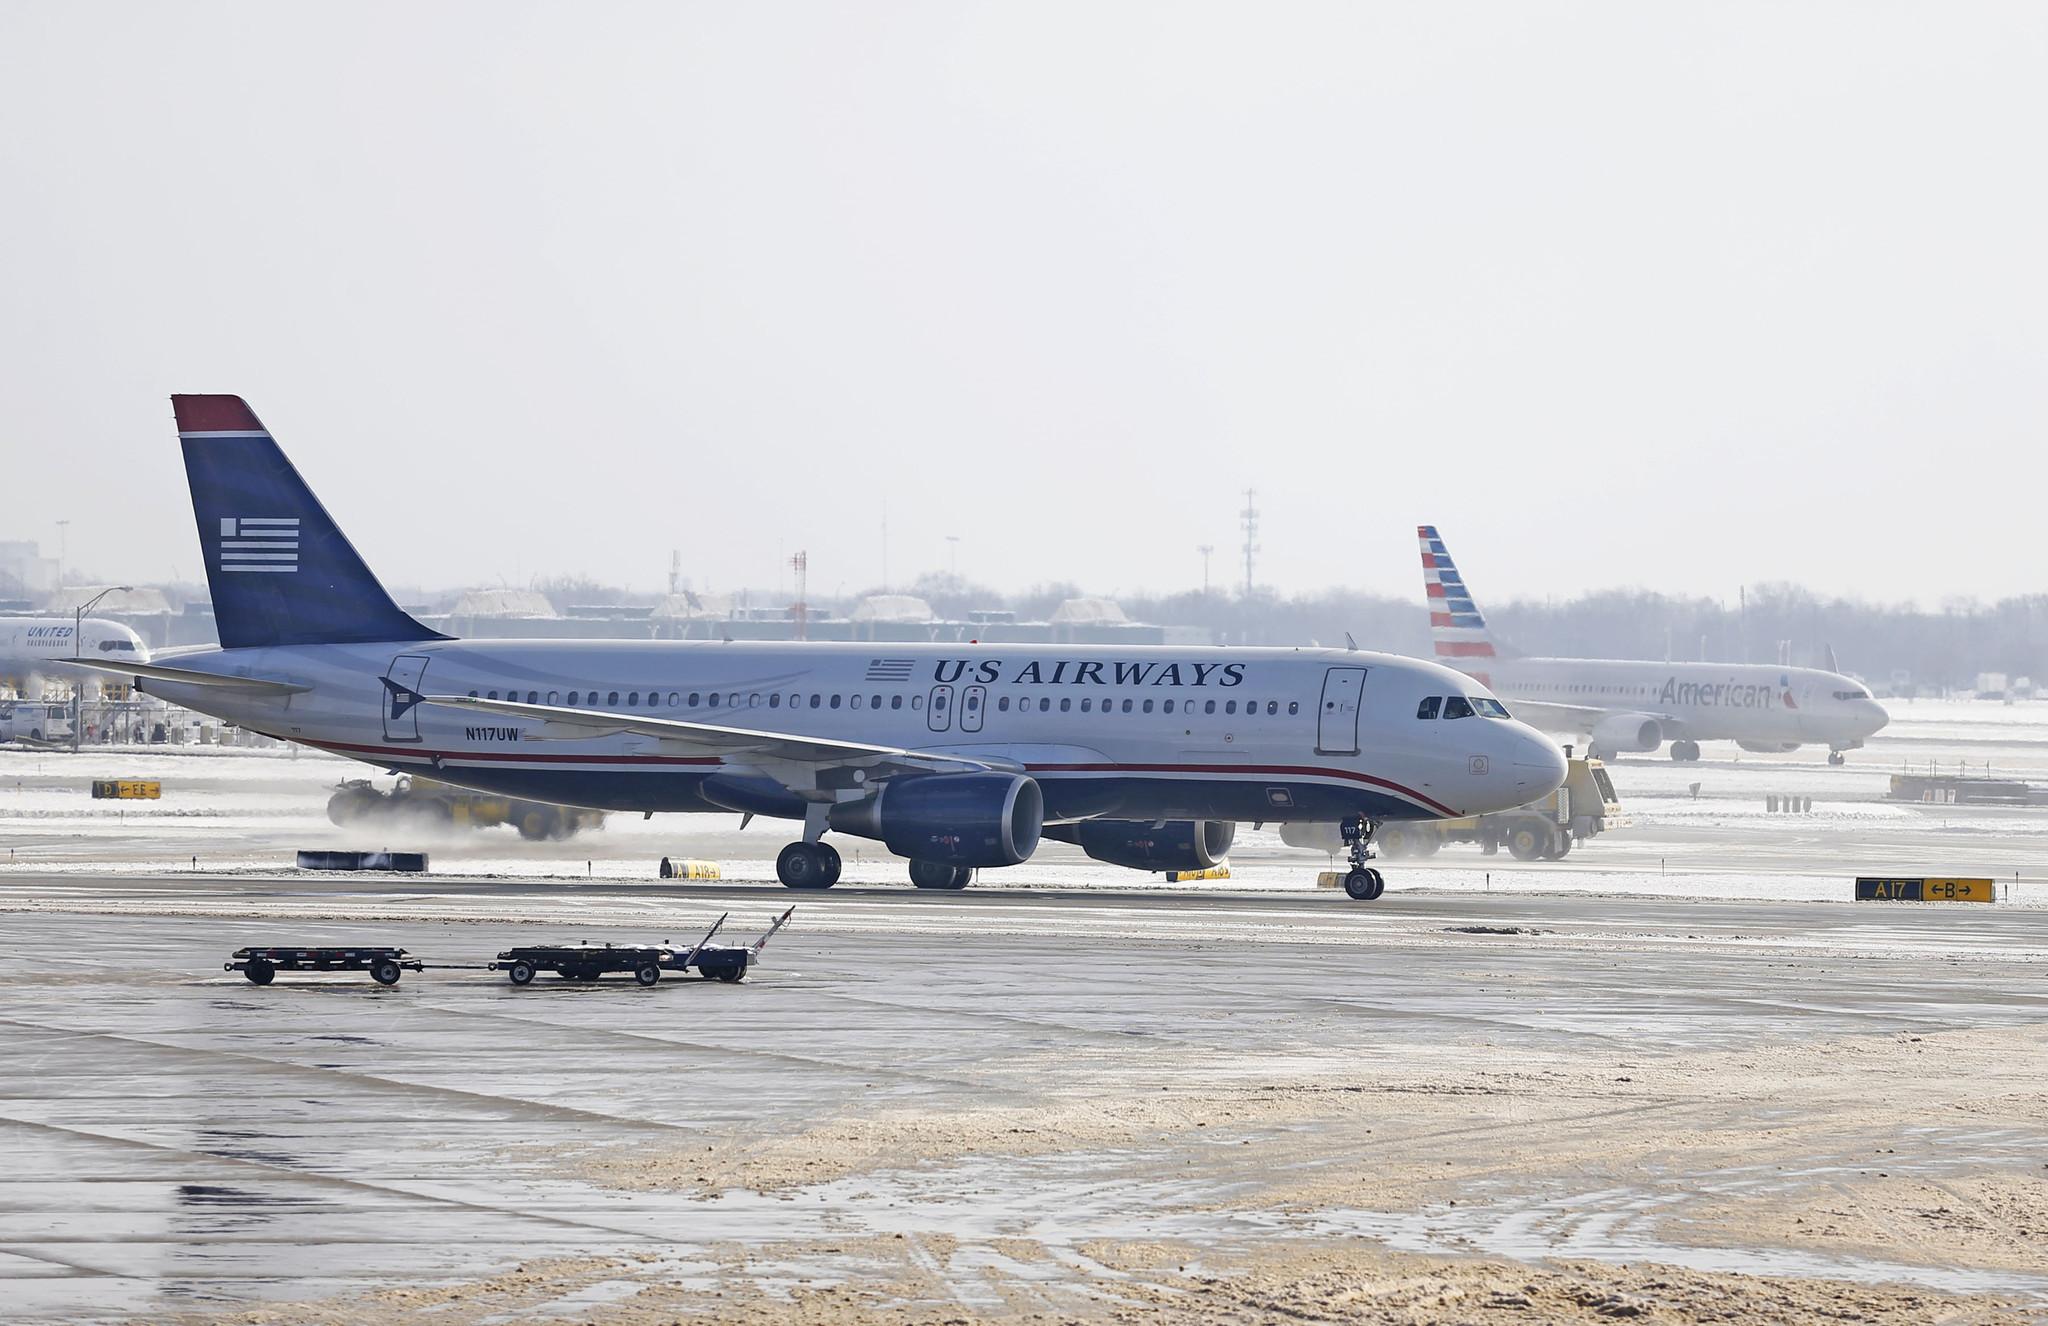 Final US Airways flight taking off from Philadelphia